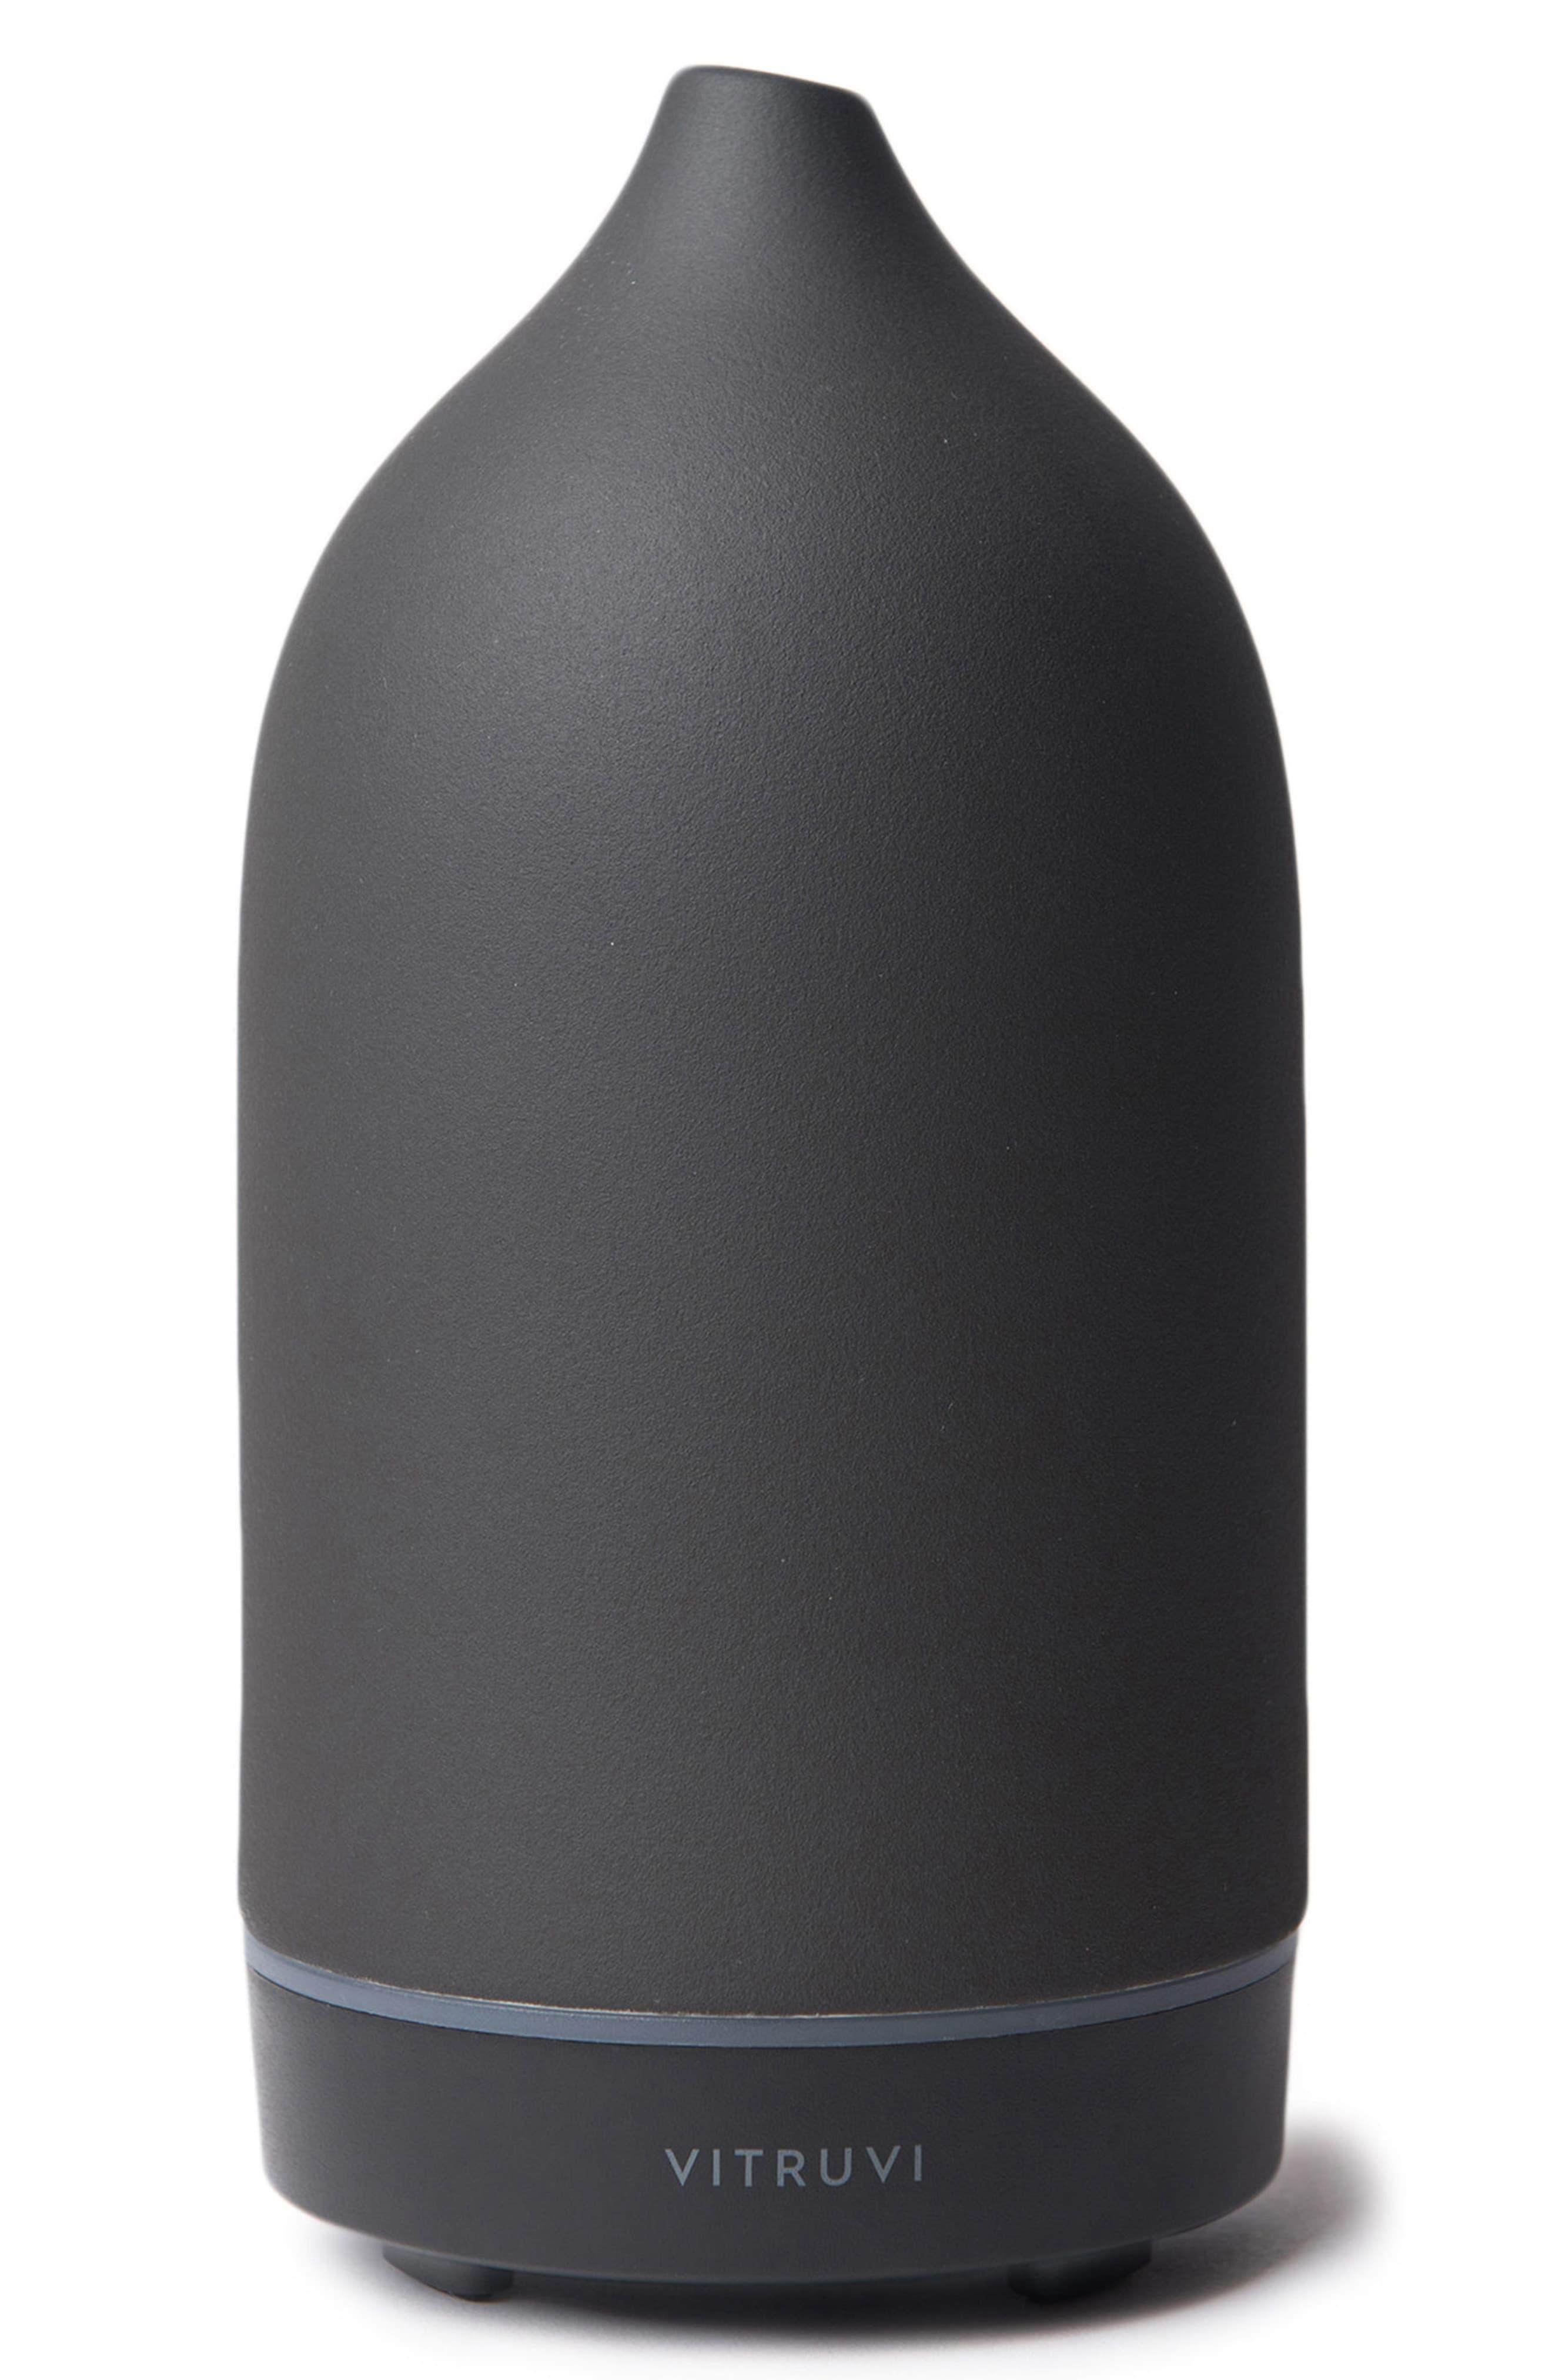 Porcelain Essential Oil Diffuser